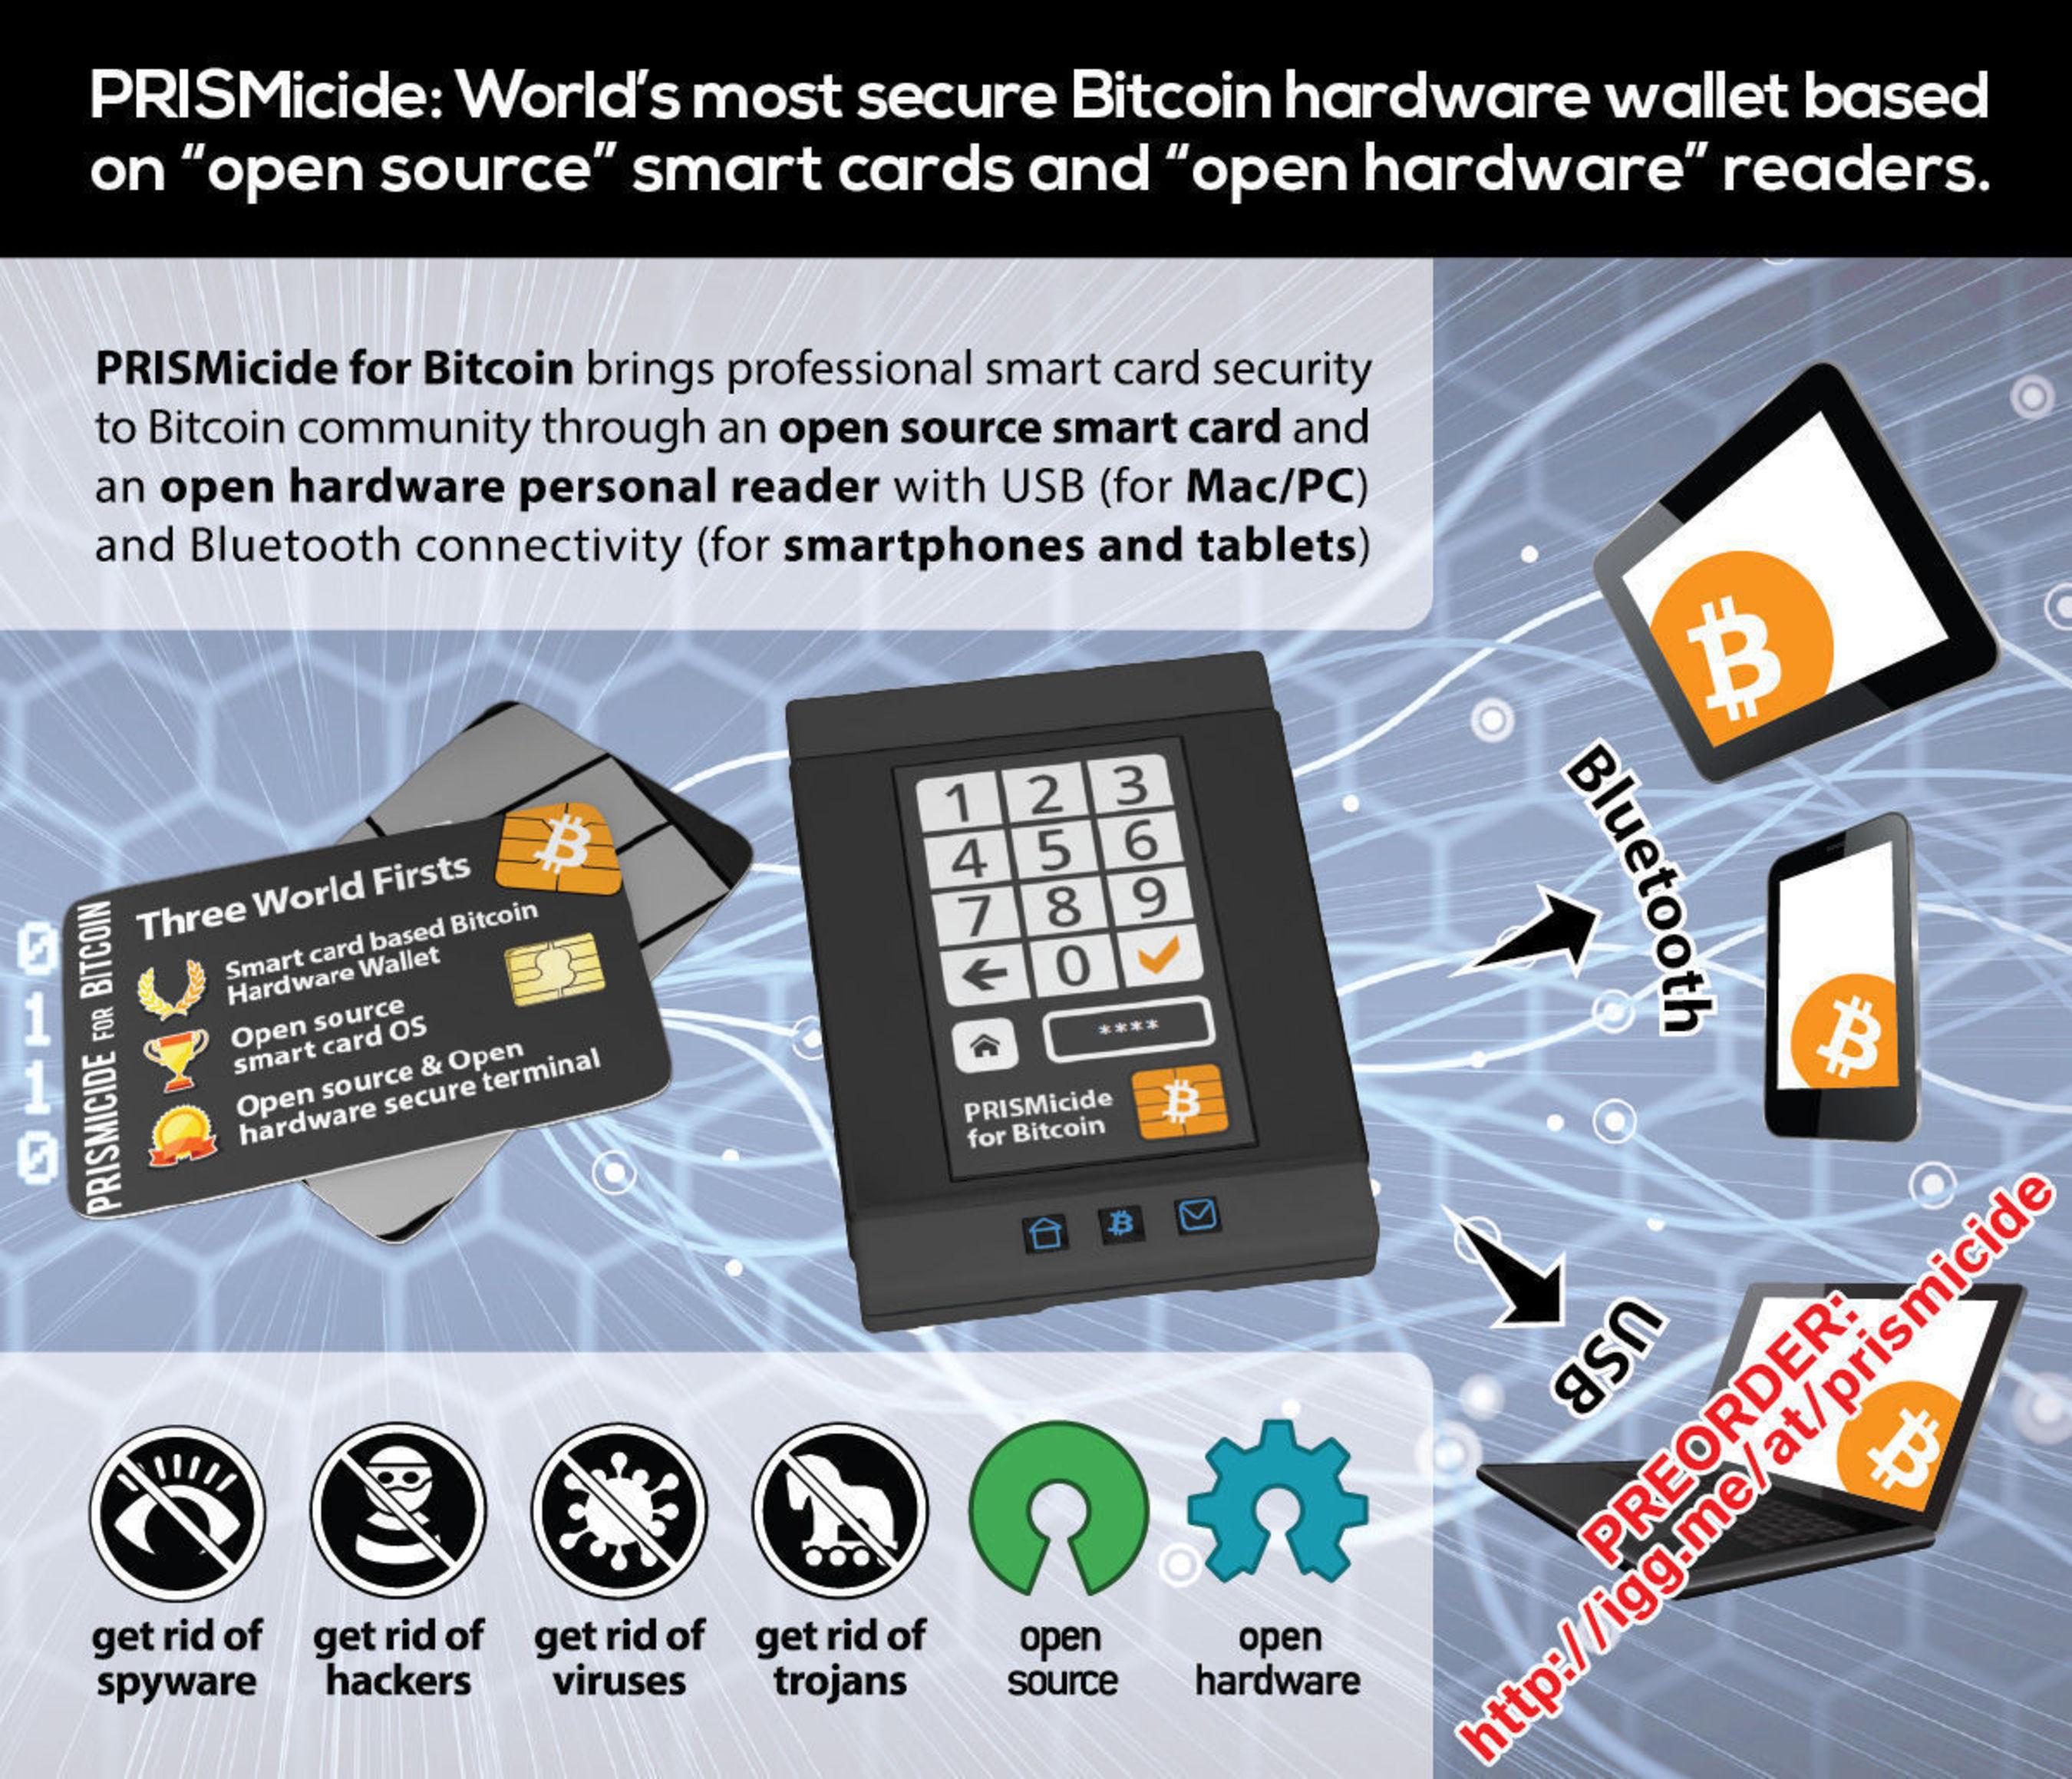 PRISMicide: World's most secure Bitcoin hardware wallet based on 'open source' smart cards and 'open hardware' readers. (PRNewsFoto/PRISMicide)